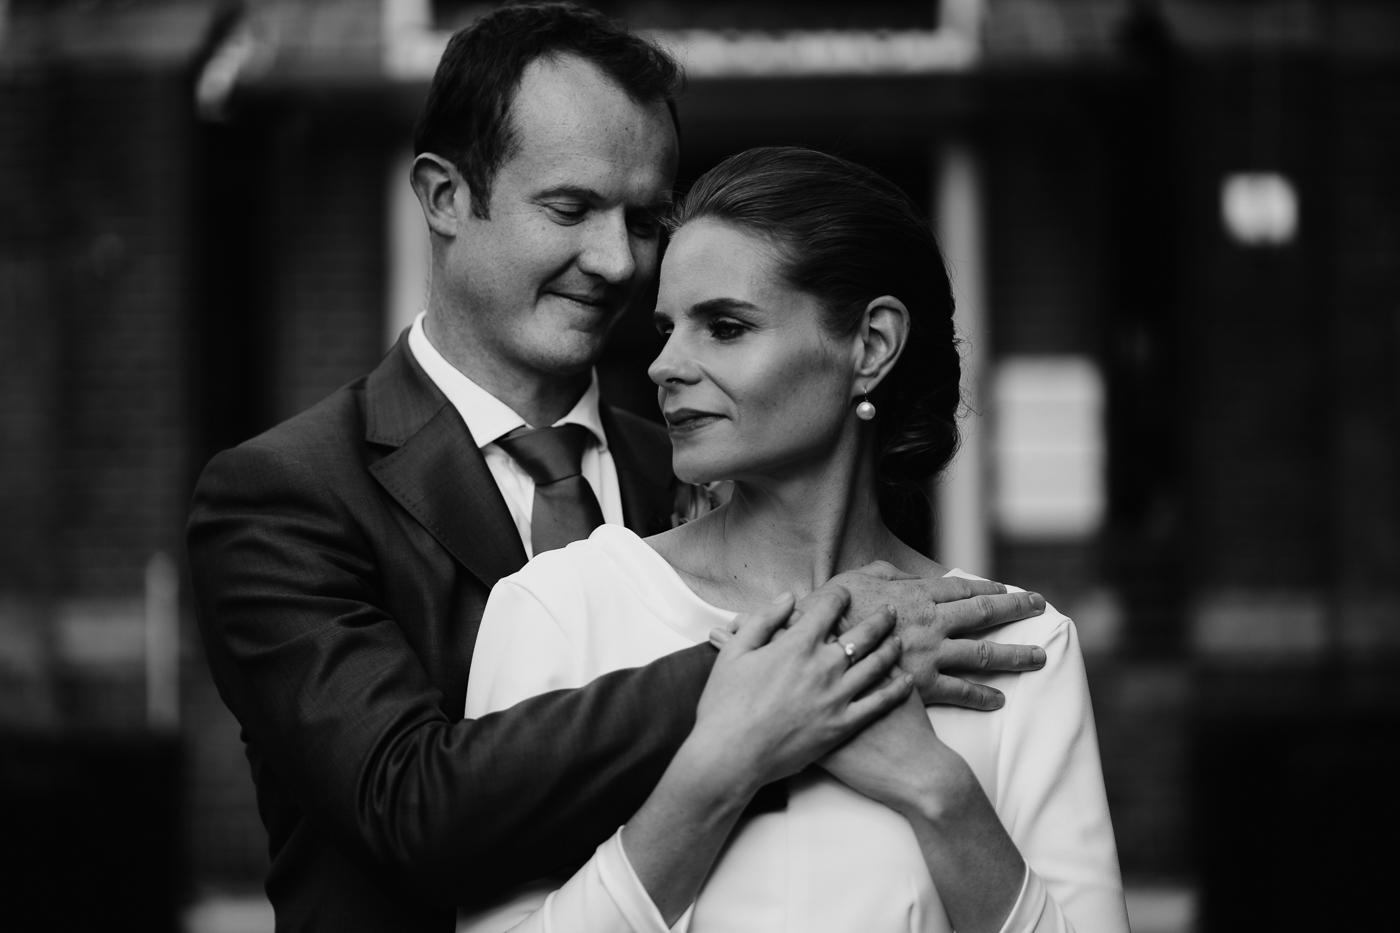 bruidsfotografie-trouwfotograaf-wedding-photographer-amsterdam-James-Jantine-284-1.jpg